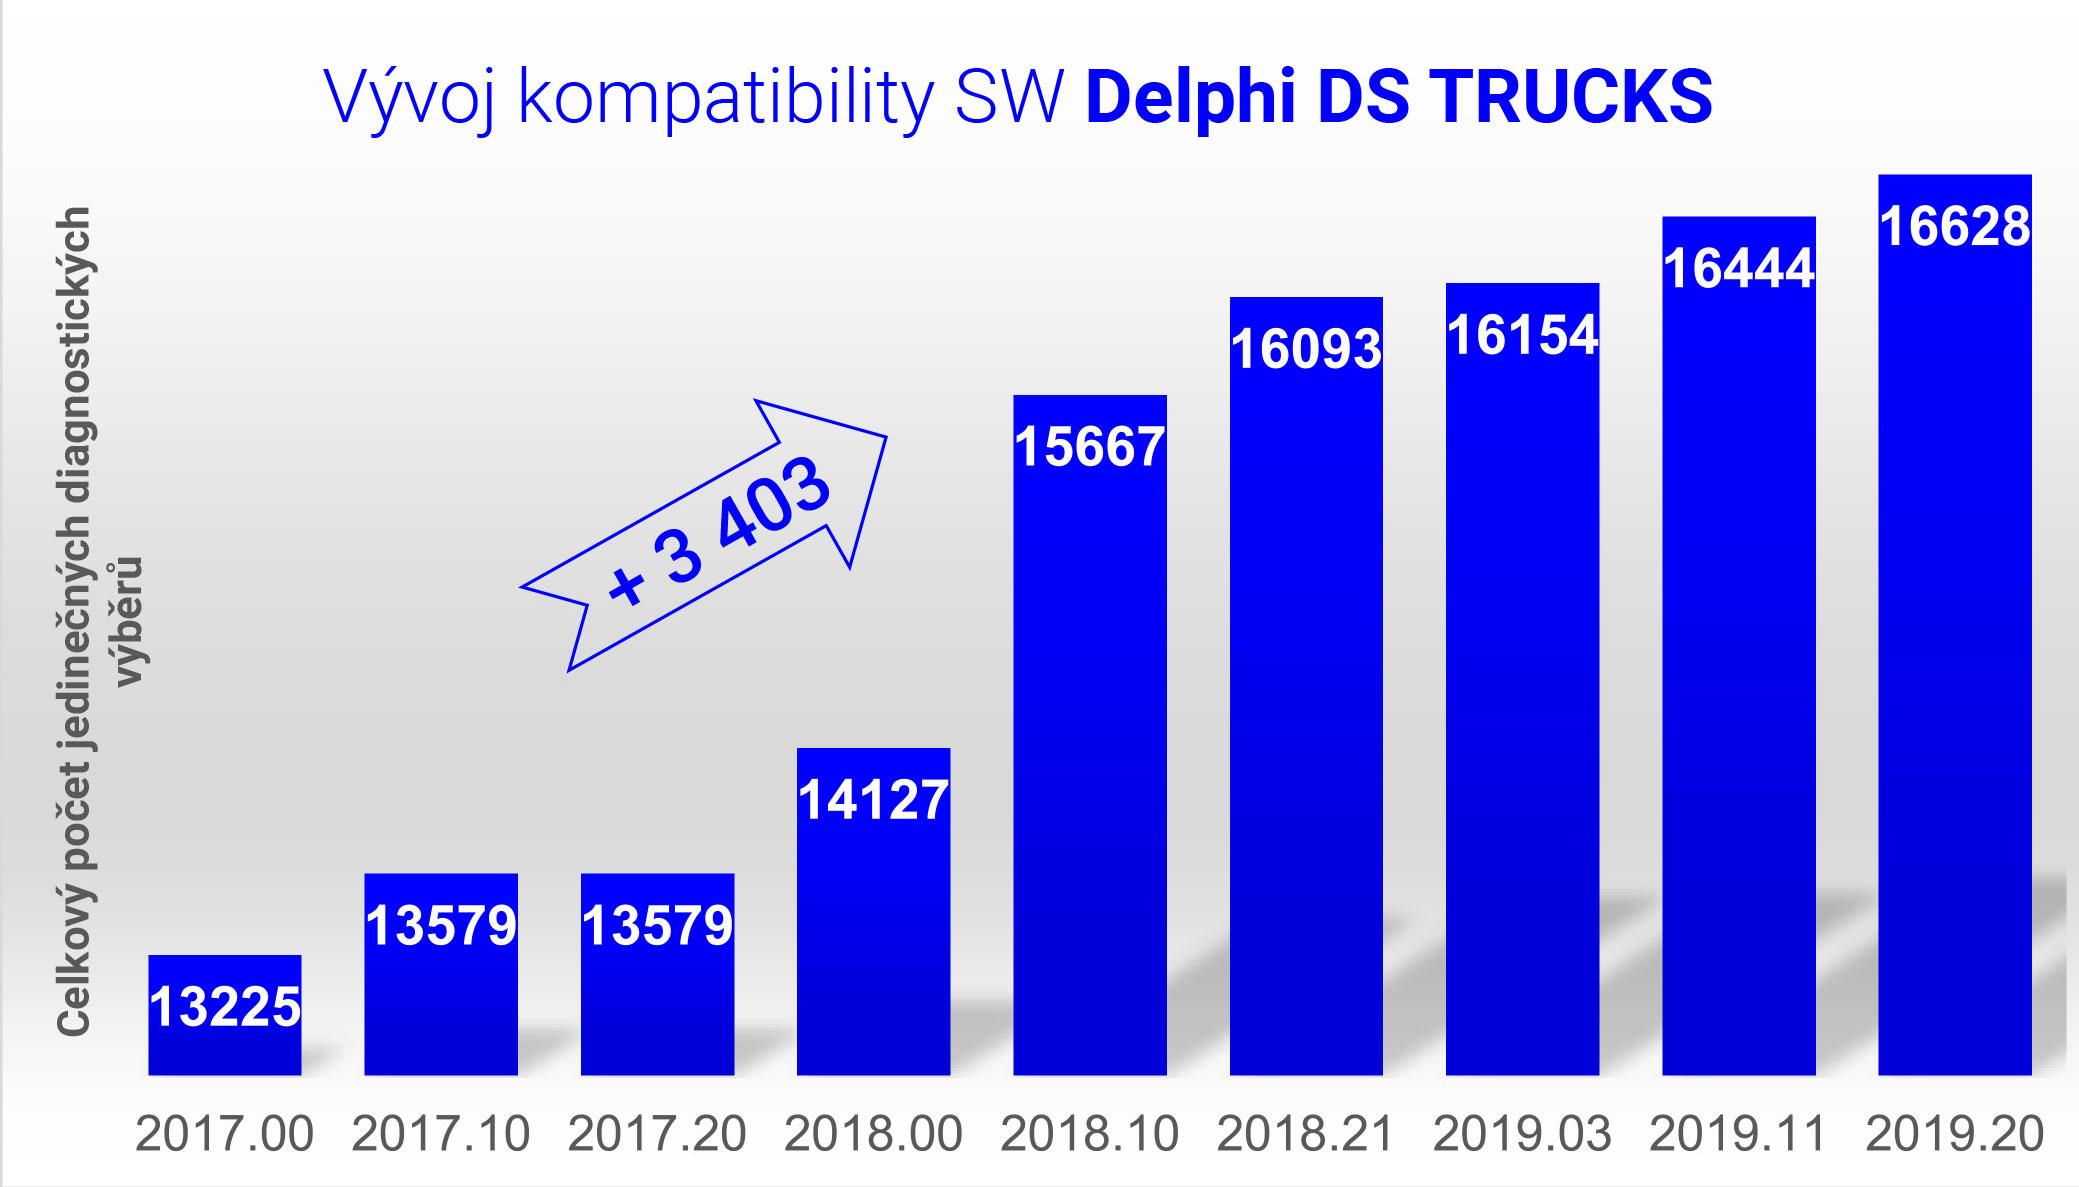 Vyvoj-kompatibility-trucks-2019-20